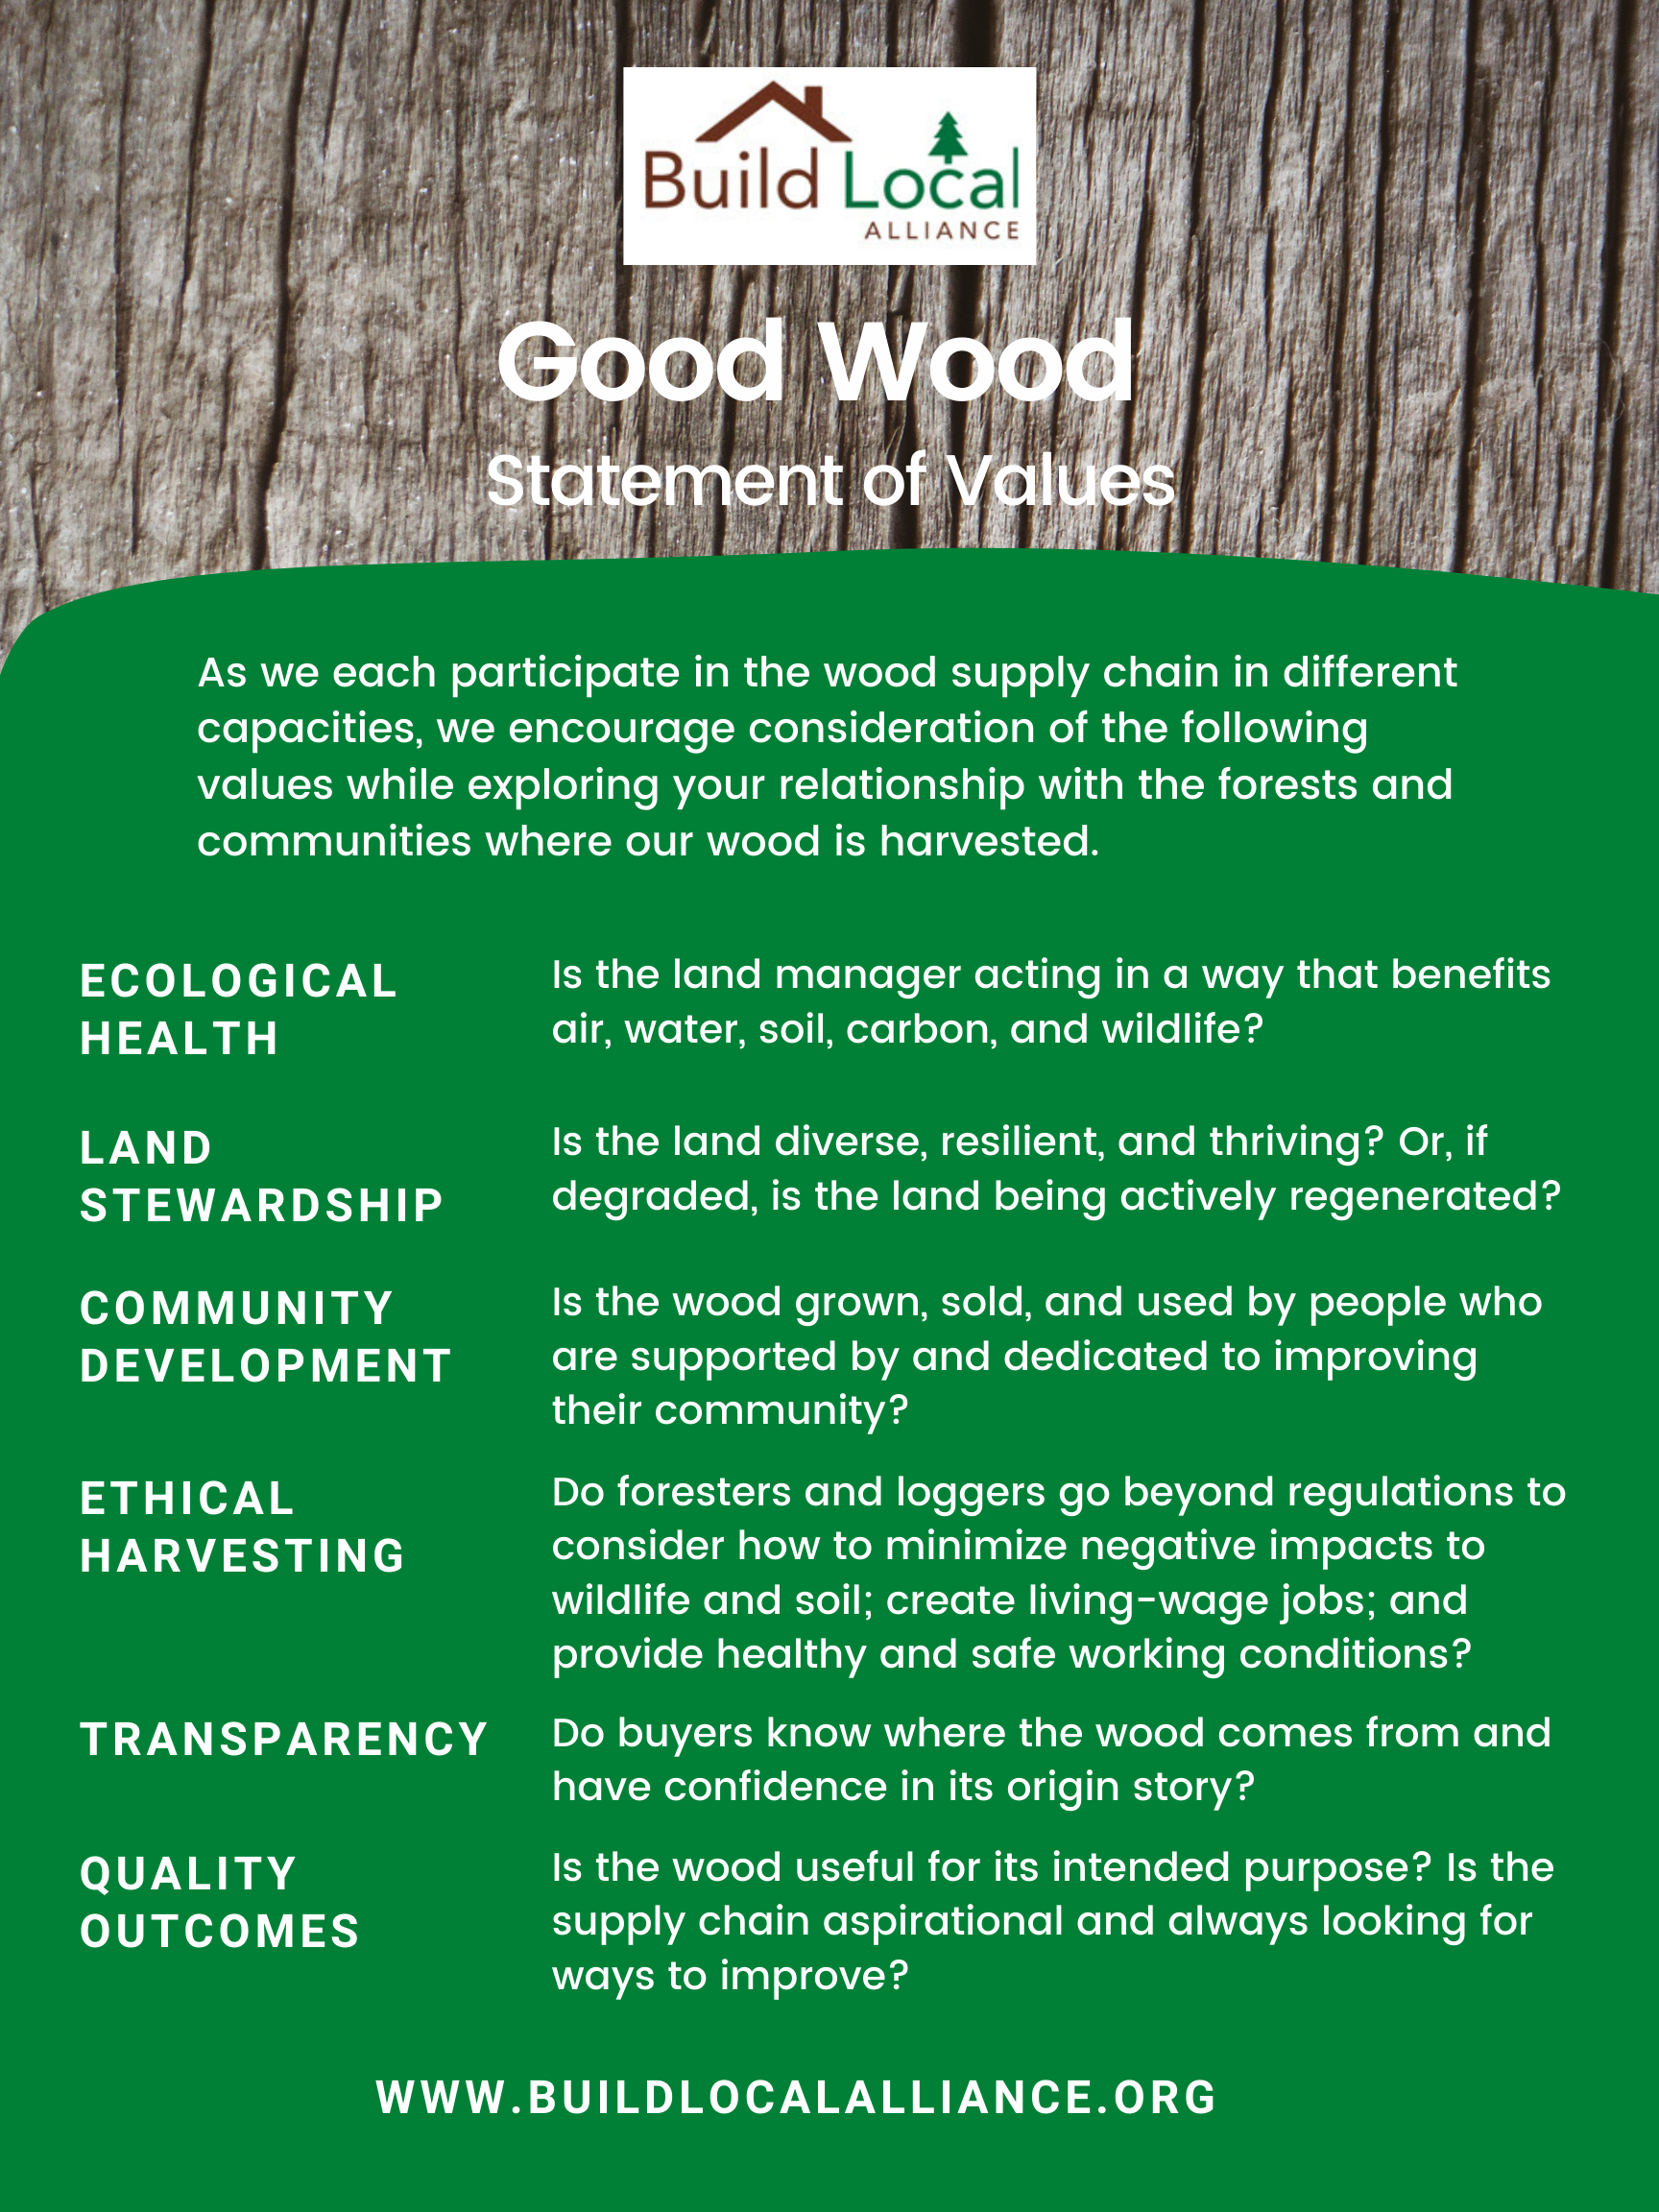 Good Wood Statement of Values